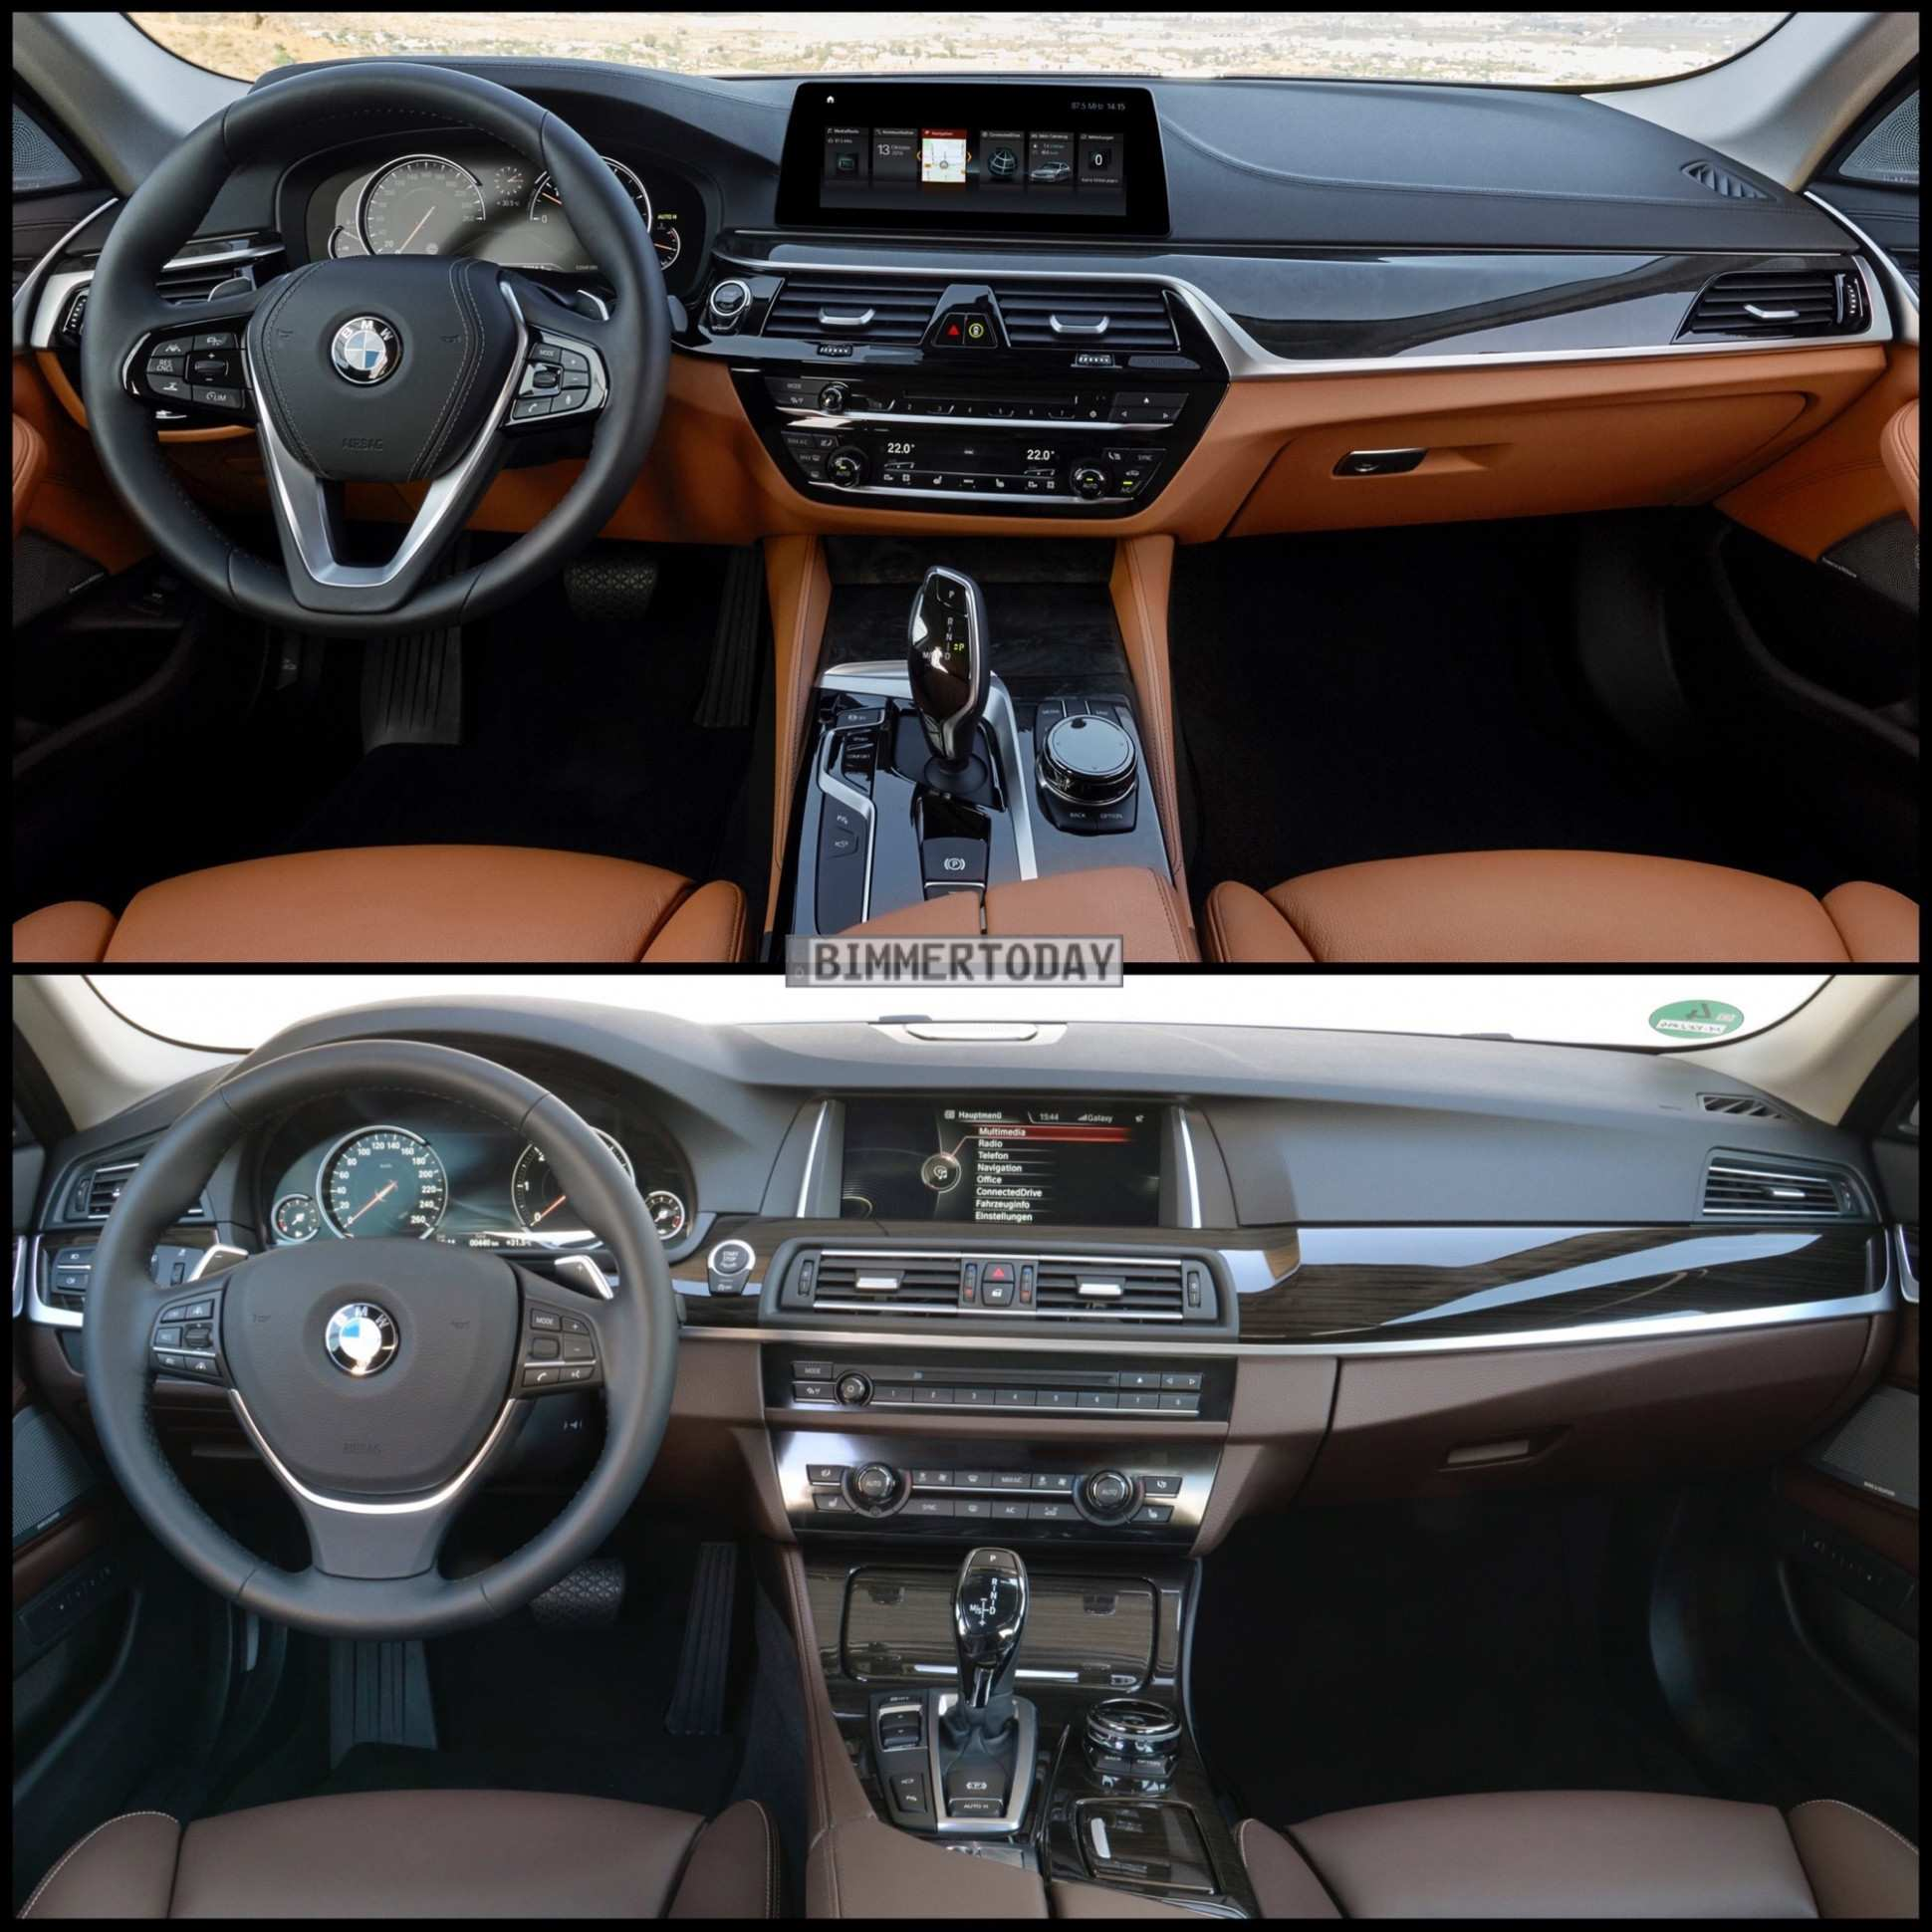 85 New Bmw G30 Lci 2020 Interior with Bmw G30 Lci 2020